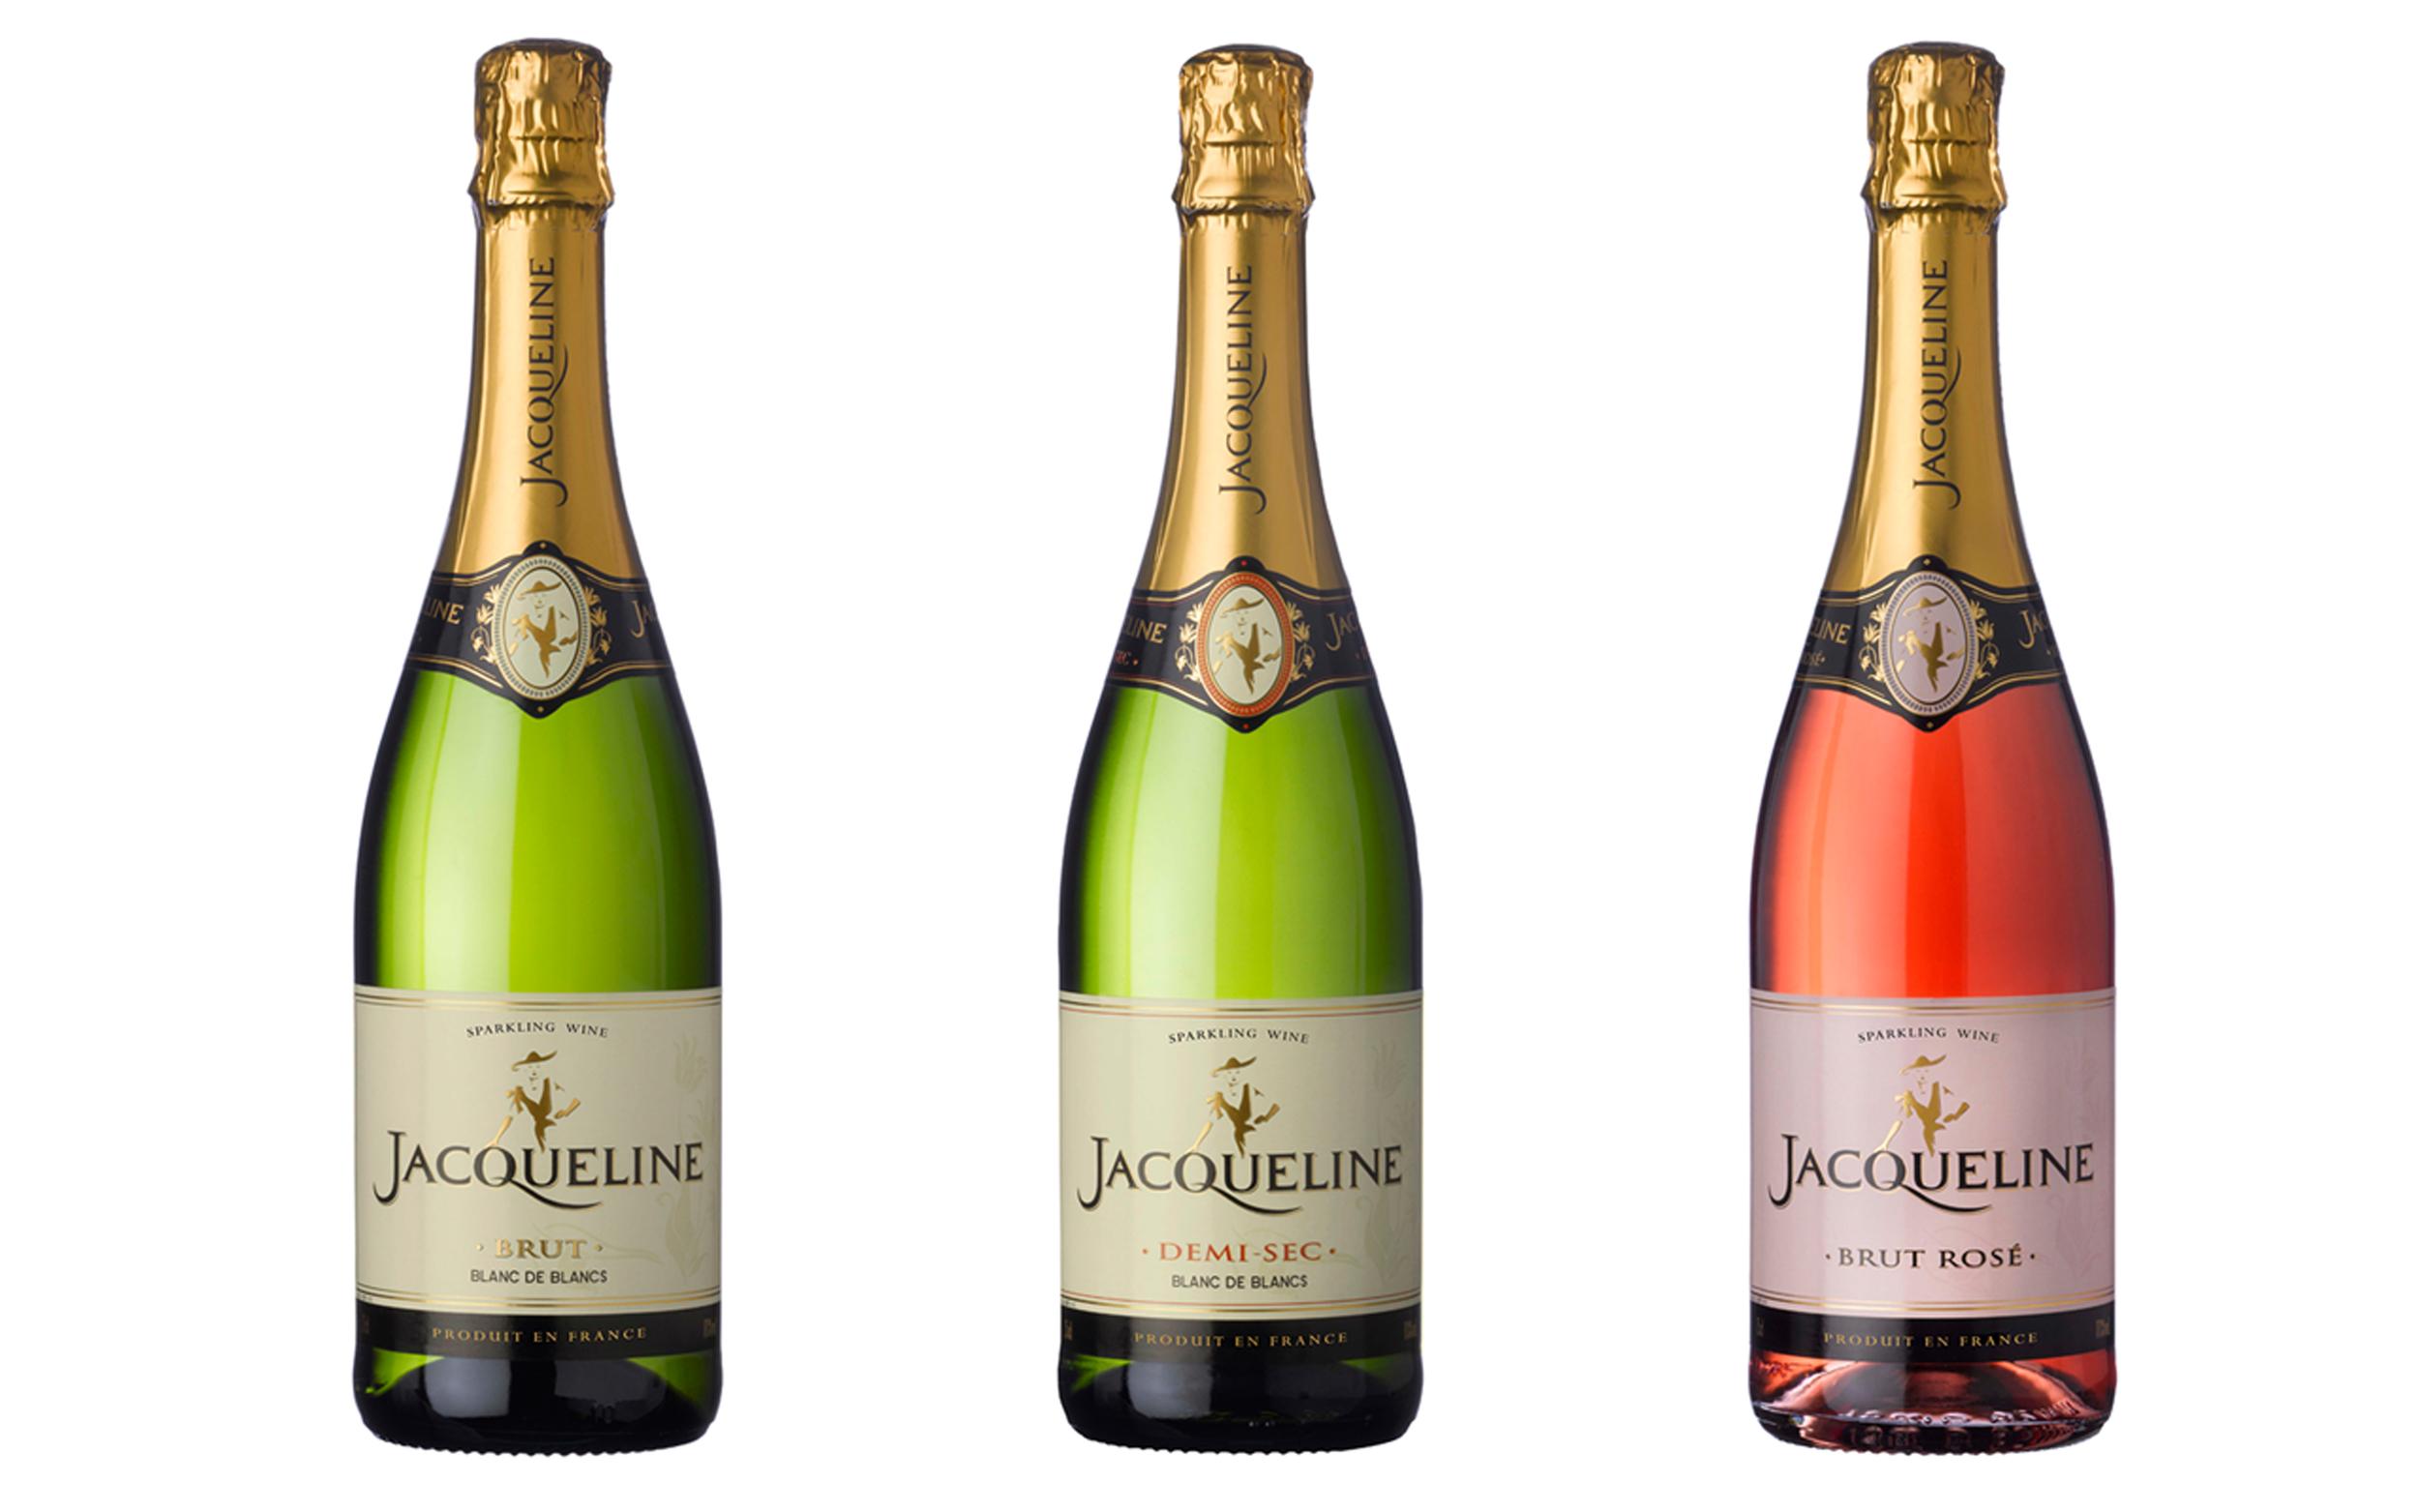 Jacqueline sparkling wine.